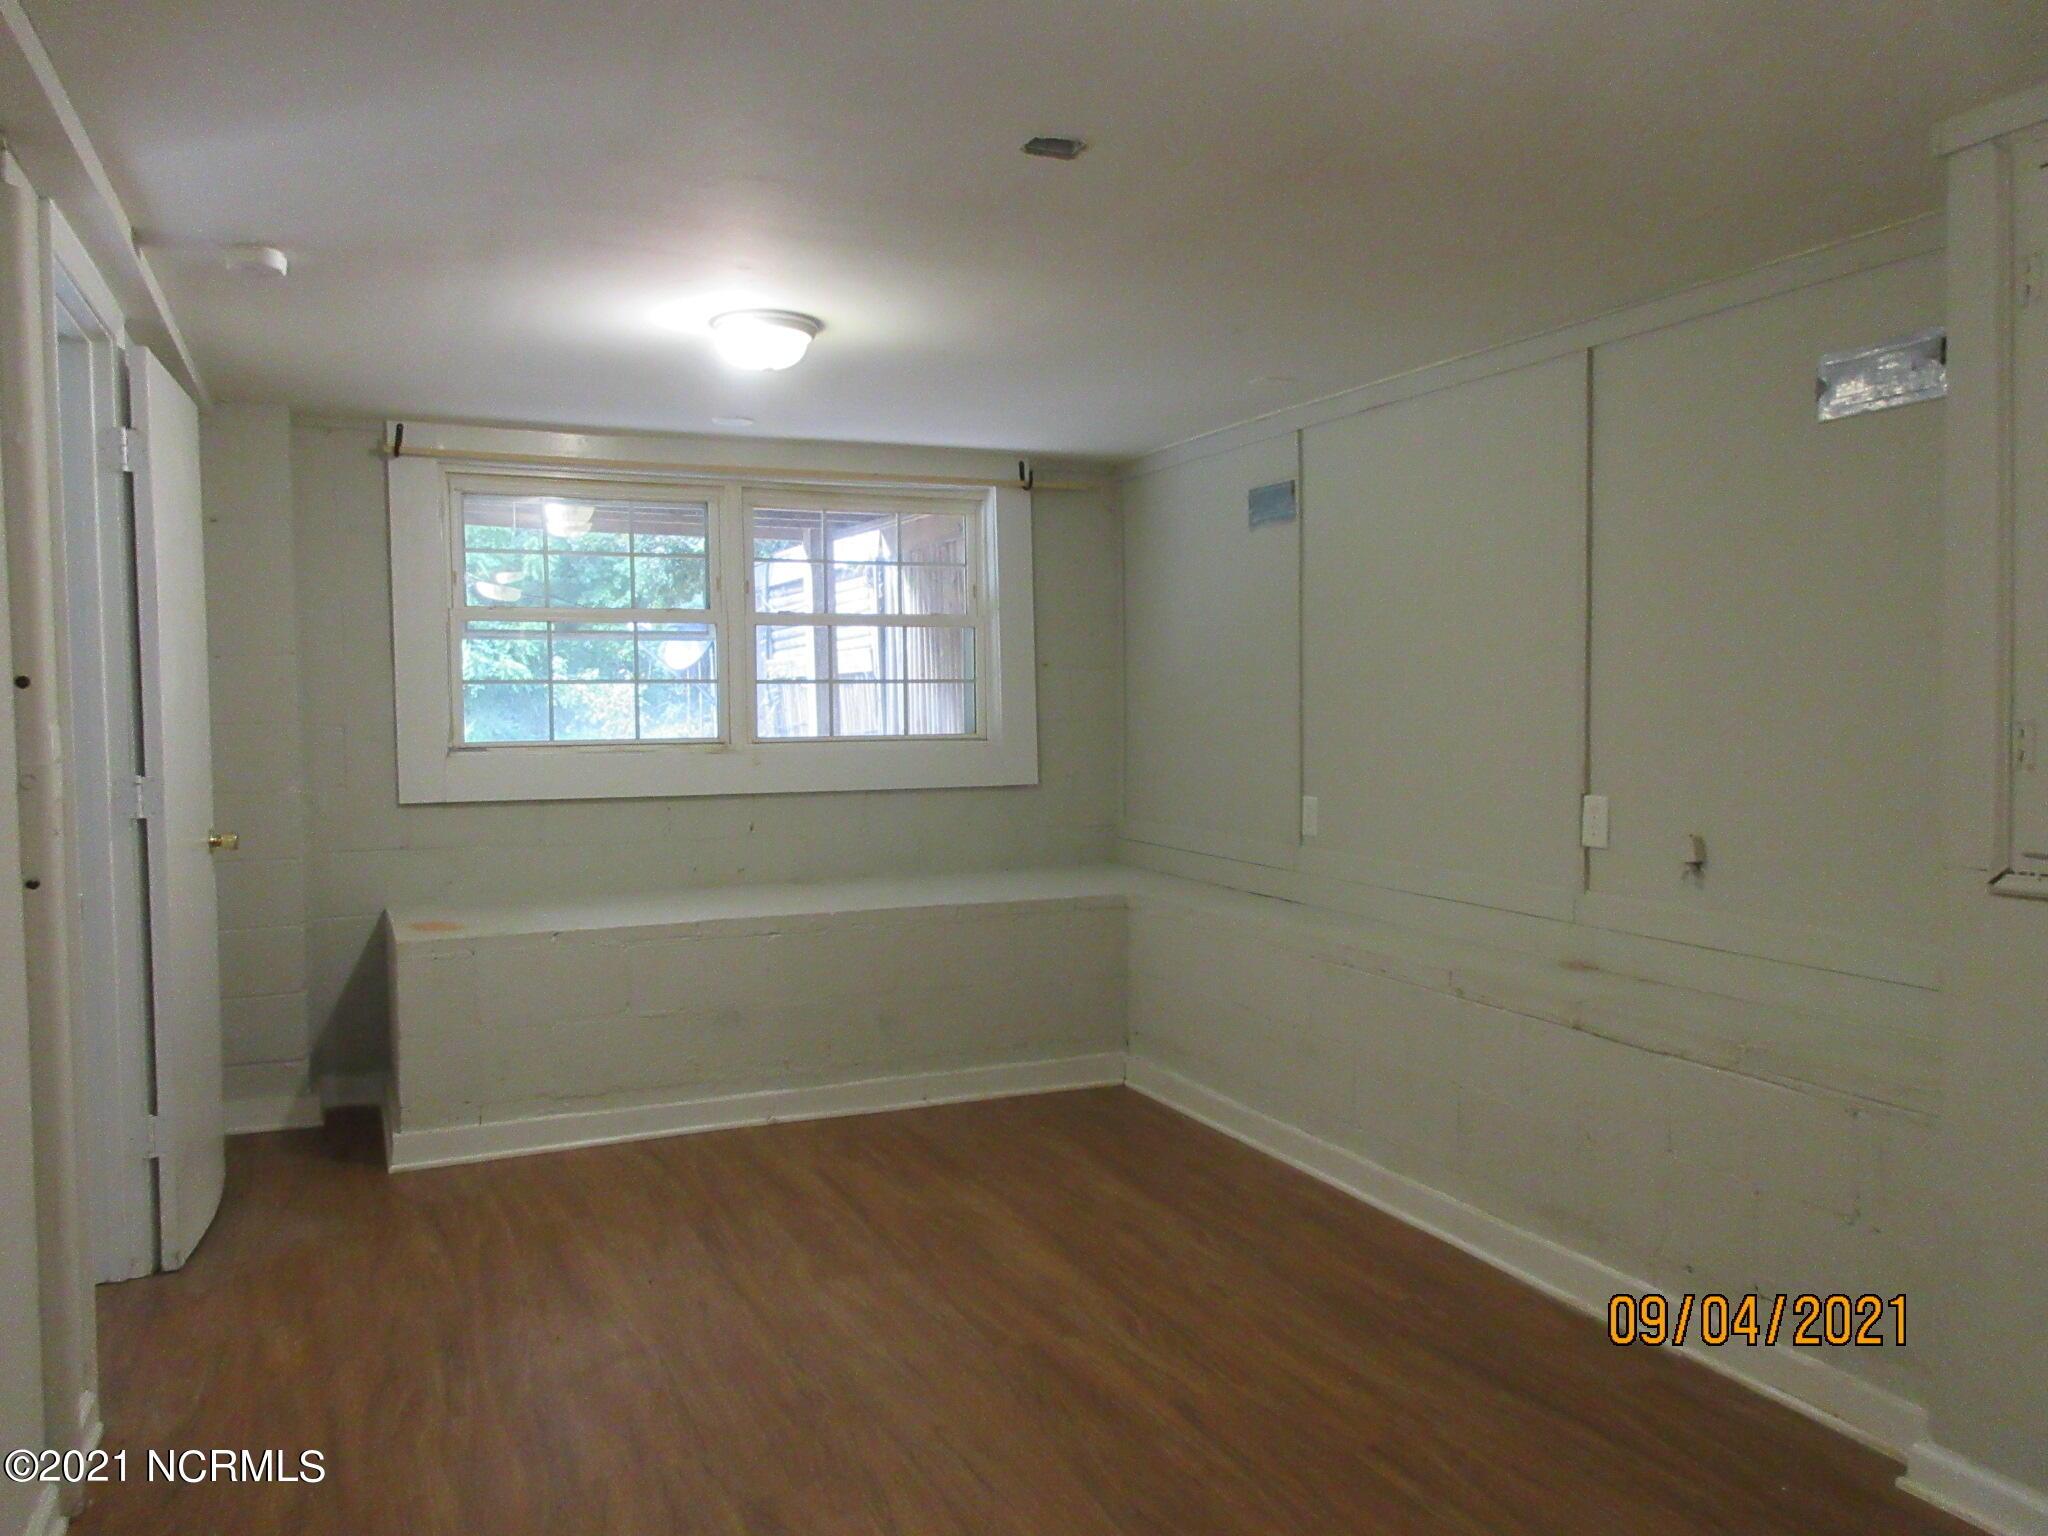 1011 Speight Street, Tarboro, North Carolina 27886, 4 Bedrooms Bedrooms, 8 Rooms Rooms,2 BathroomsBathrooms,Single family residence,For sale,Speight,100286182